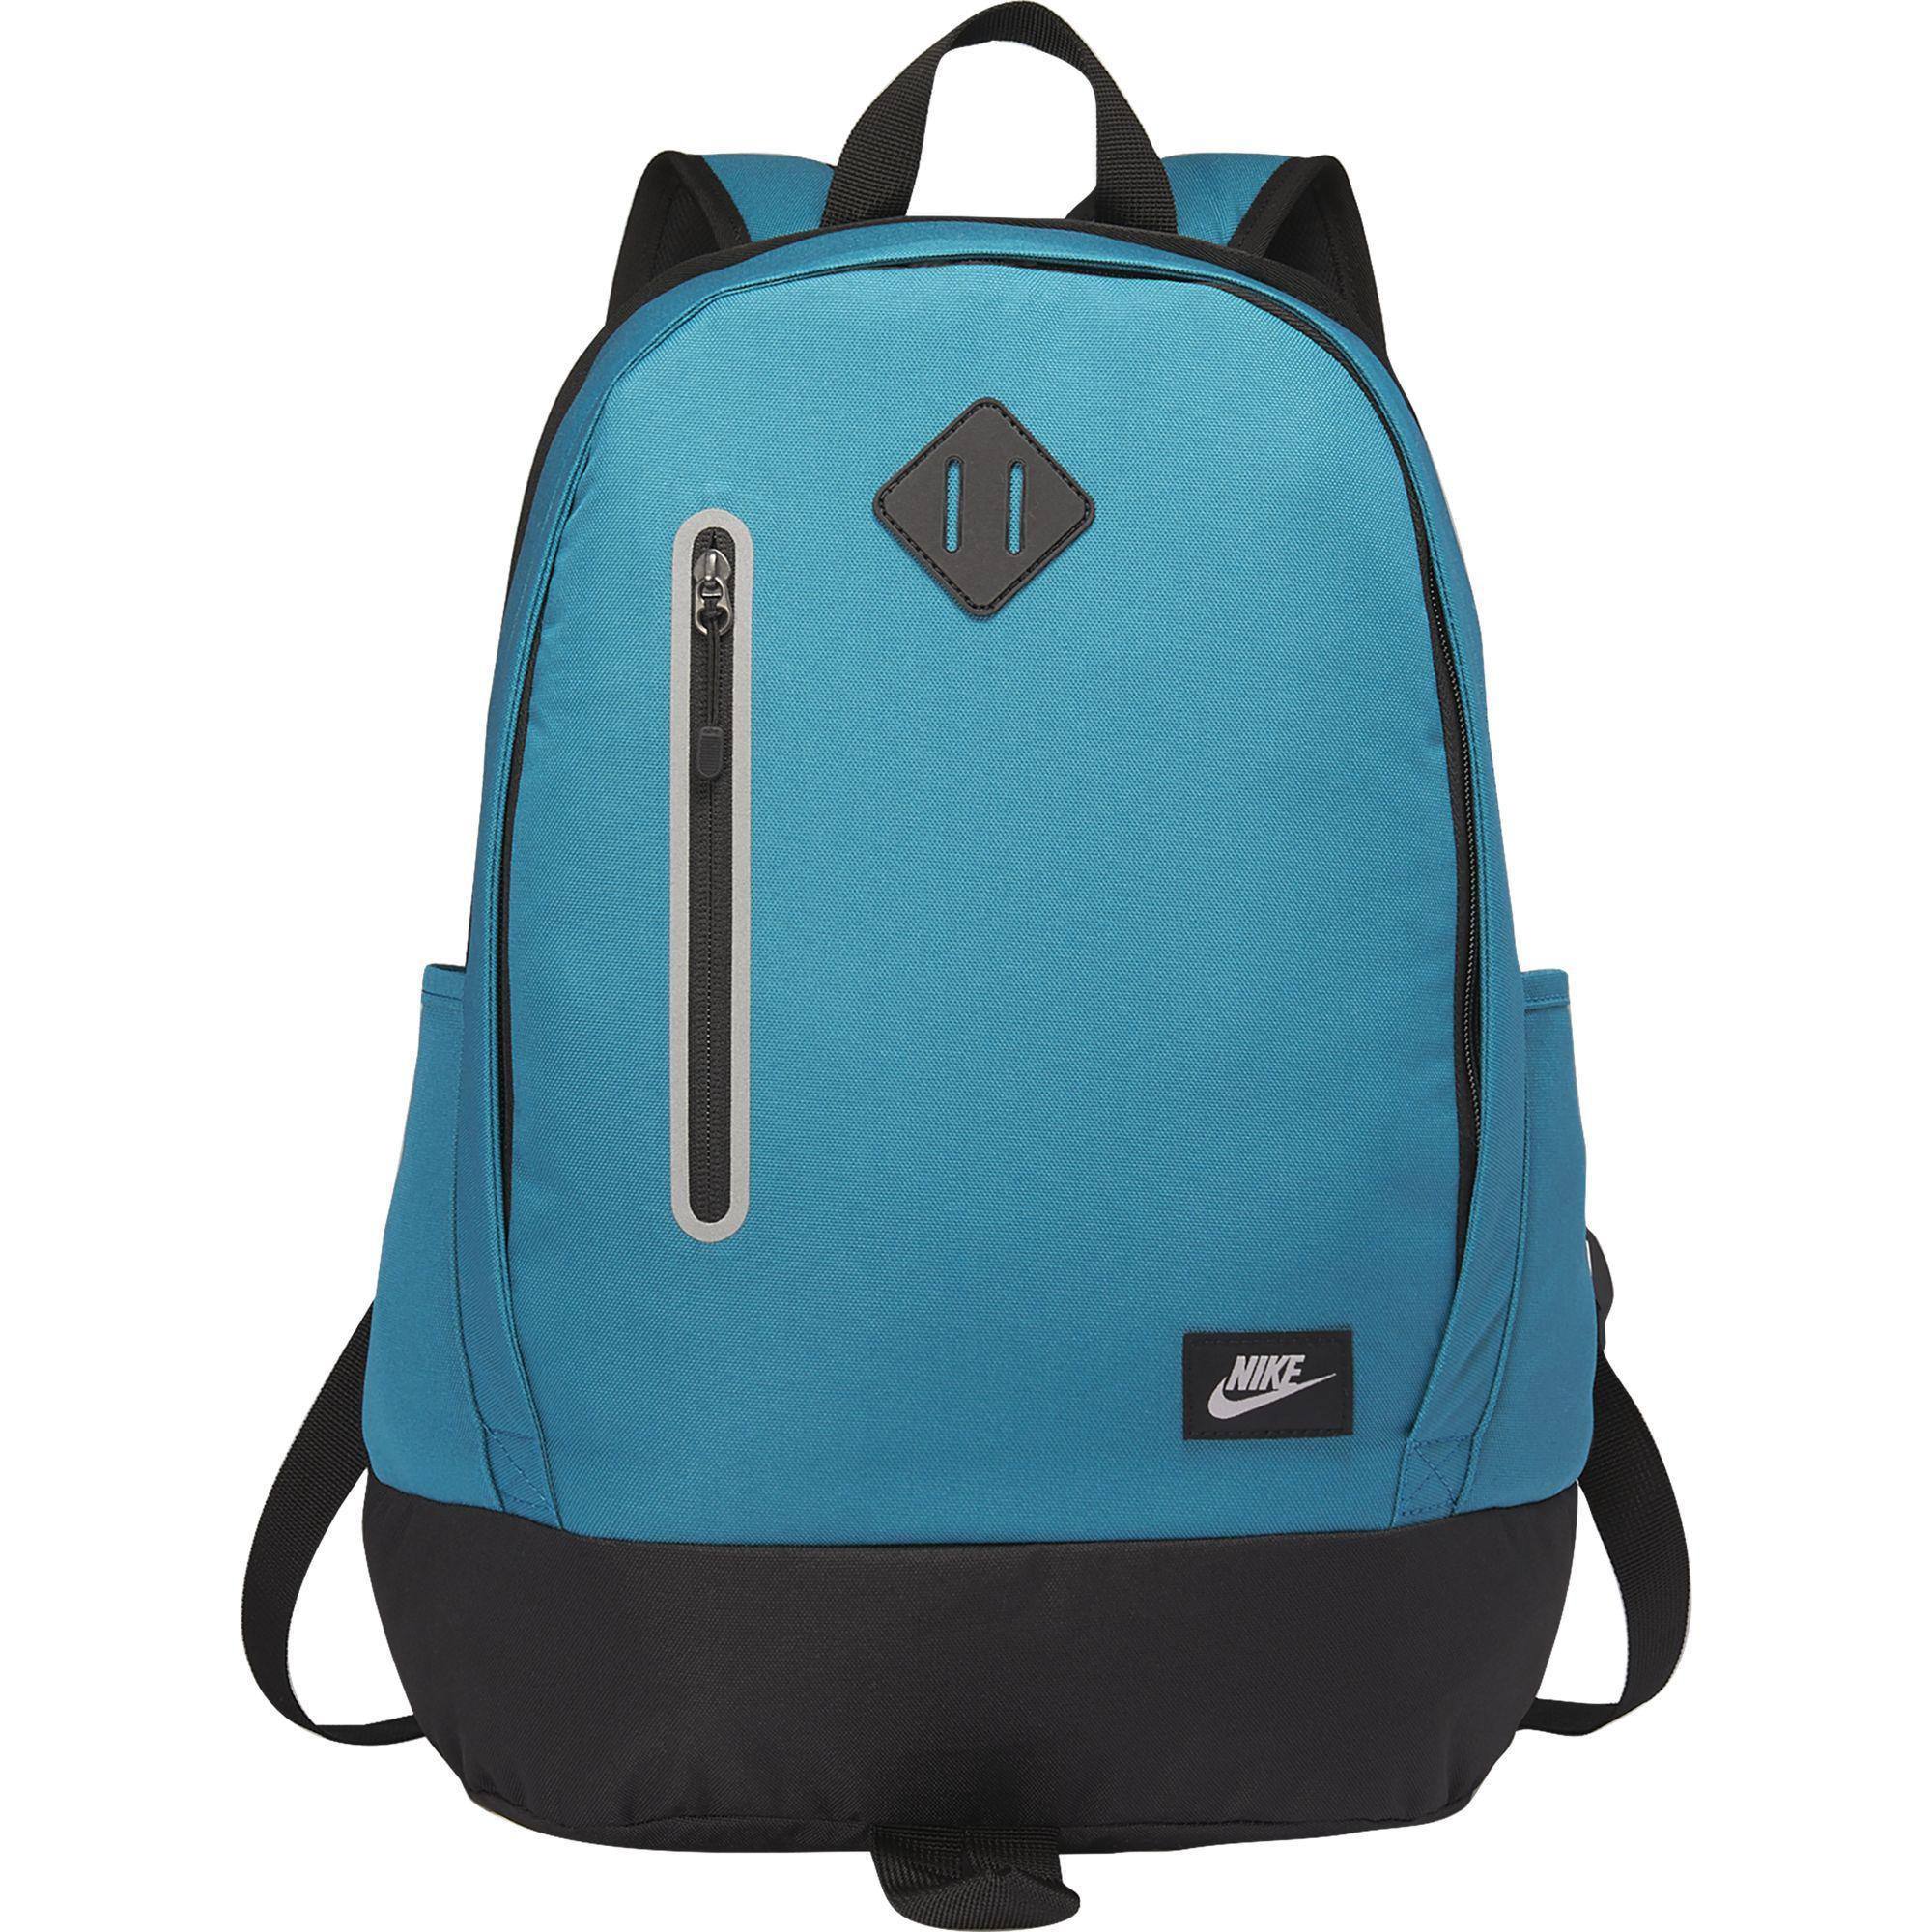 Nike Cheyenne Solid Kids Backpack - Bluestery - Tennisnuts.com b681d329e8de2